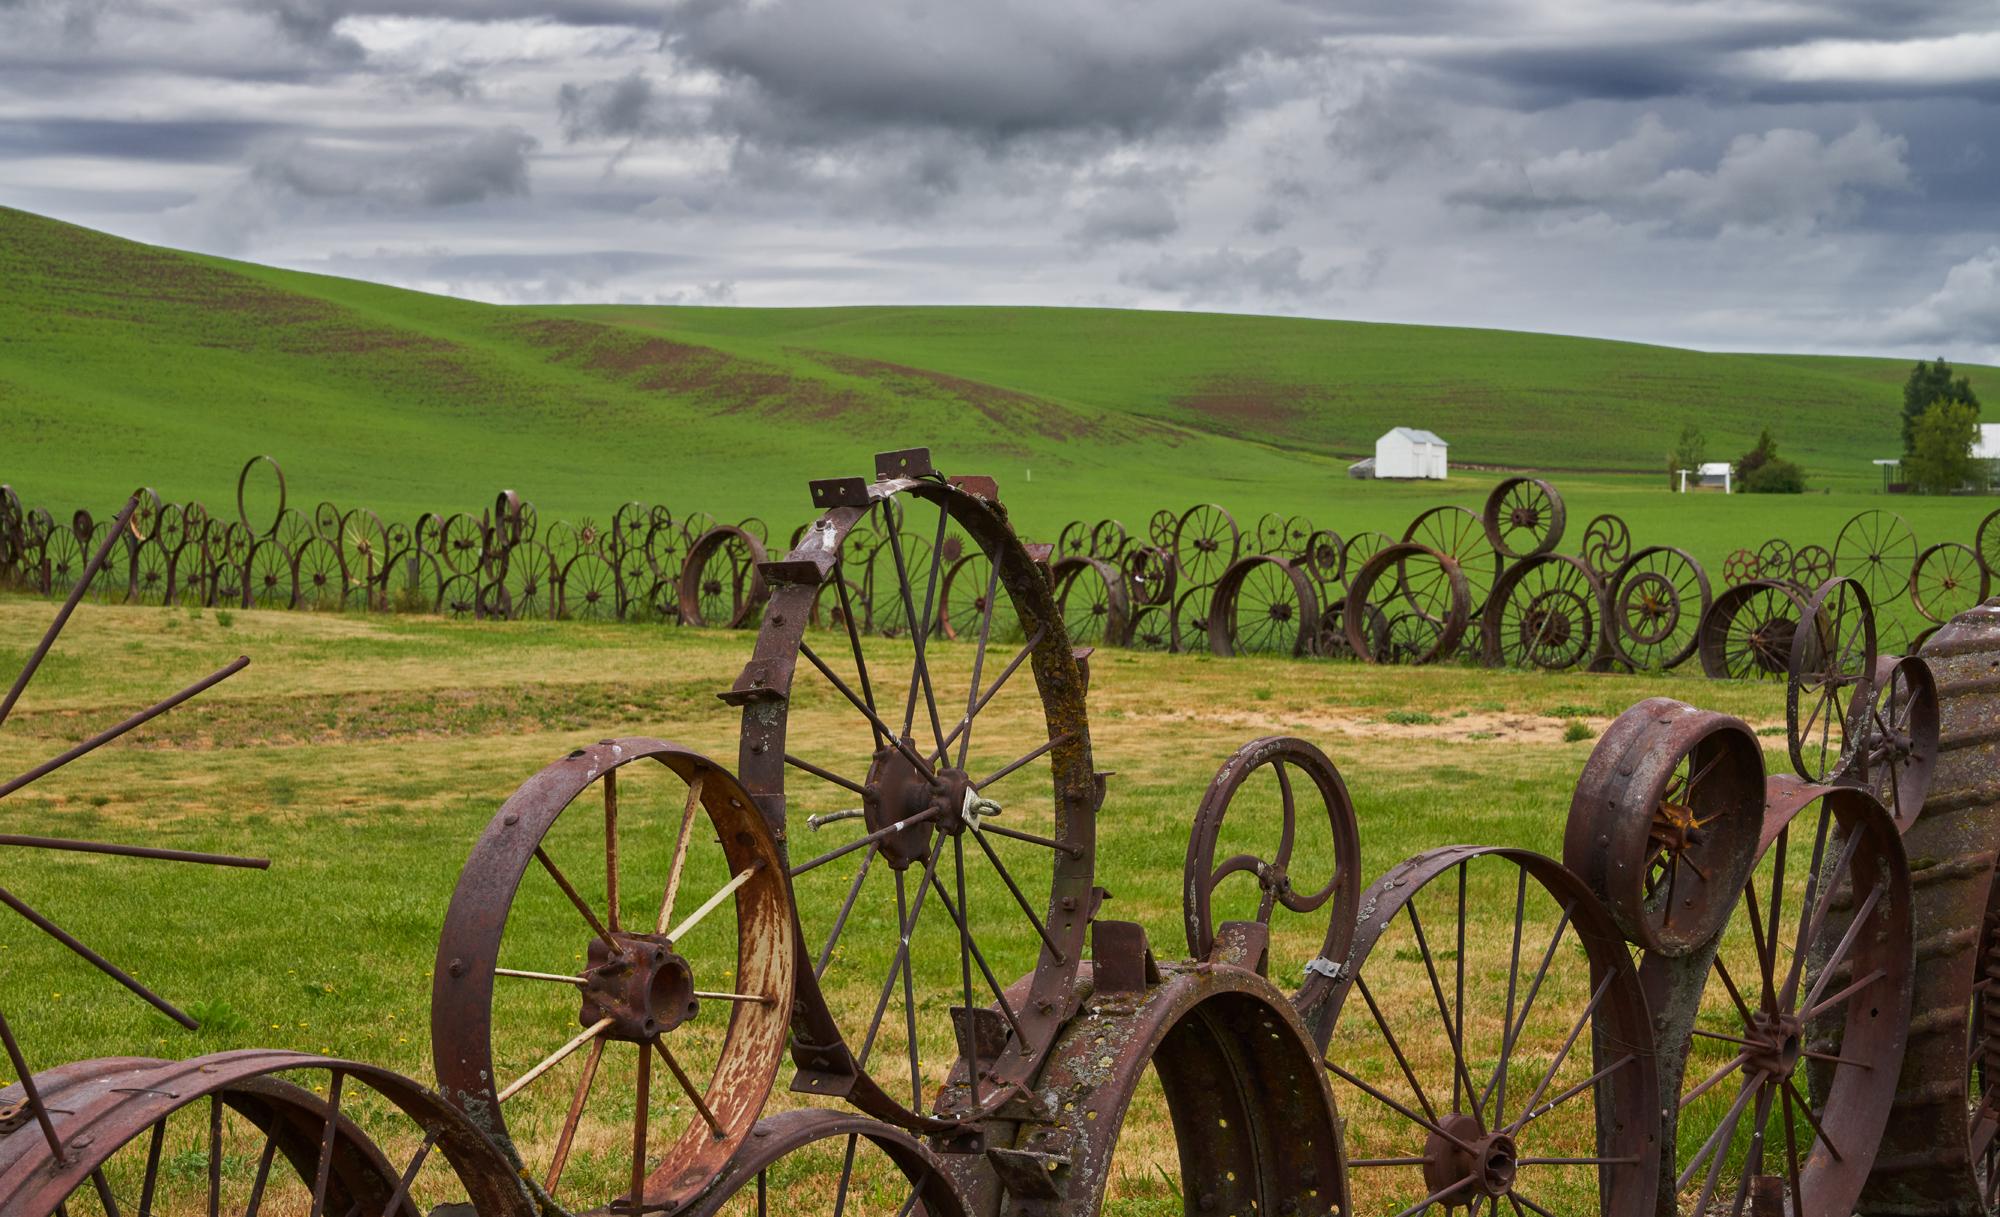 The iconic wagon wheel fence